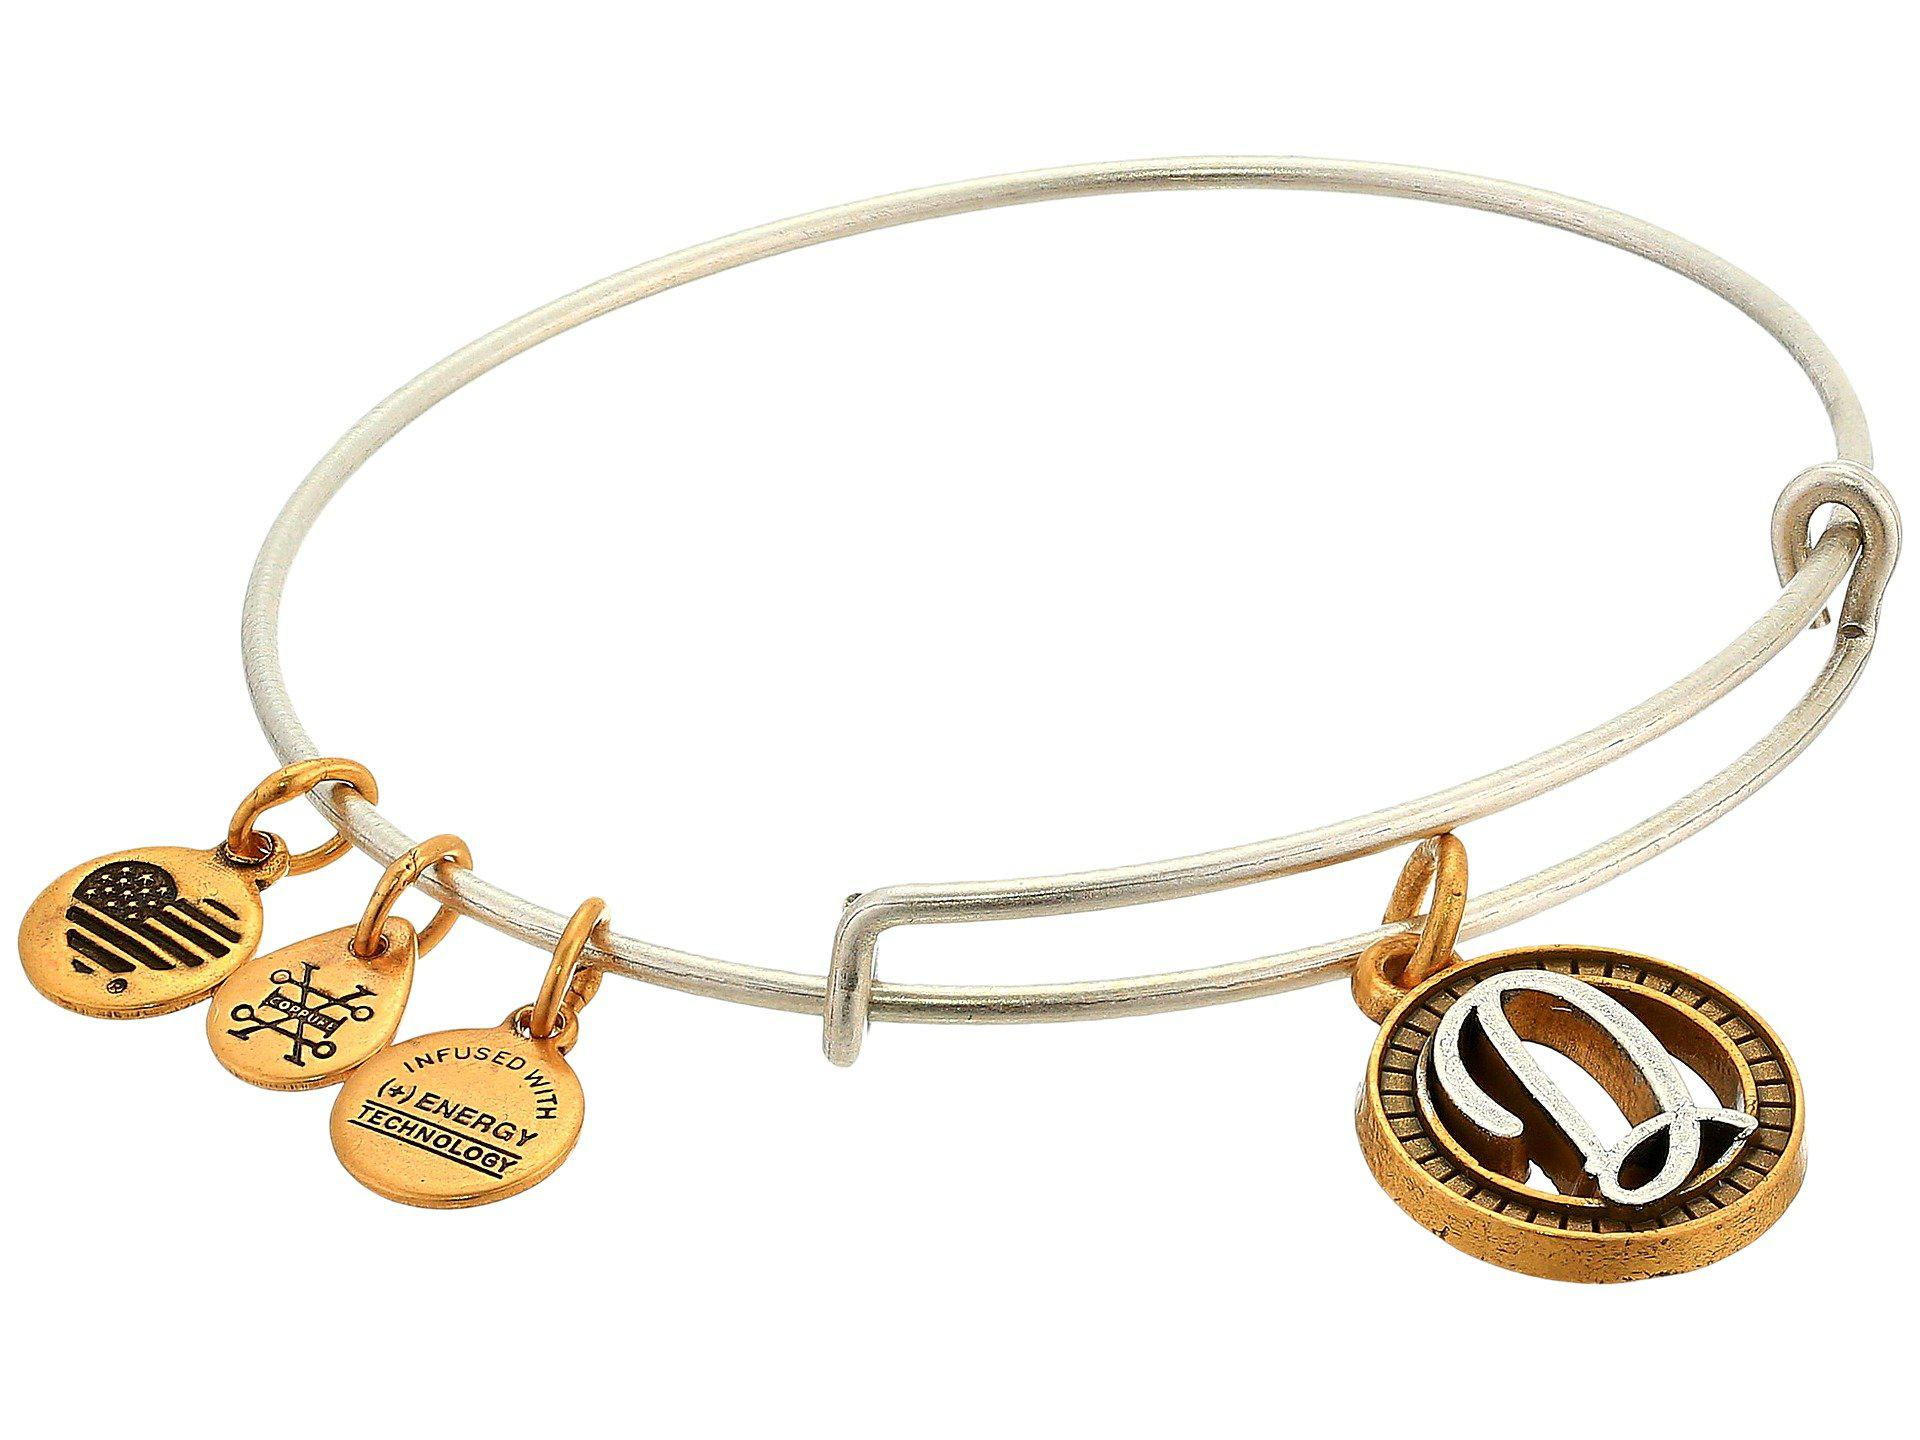 317ec5576d9 ALEX AND ANI. Women's Metallic Initial D Charm Bangle (two-tone) Bracelet